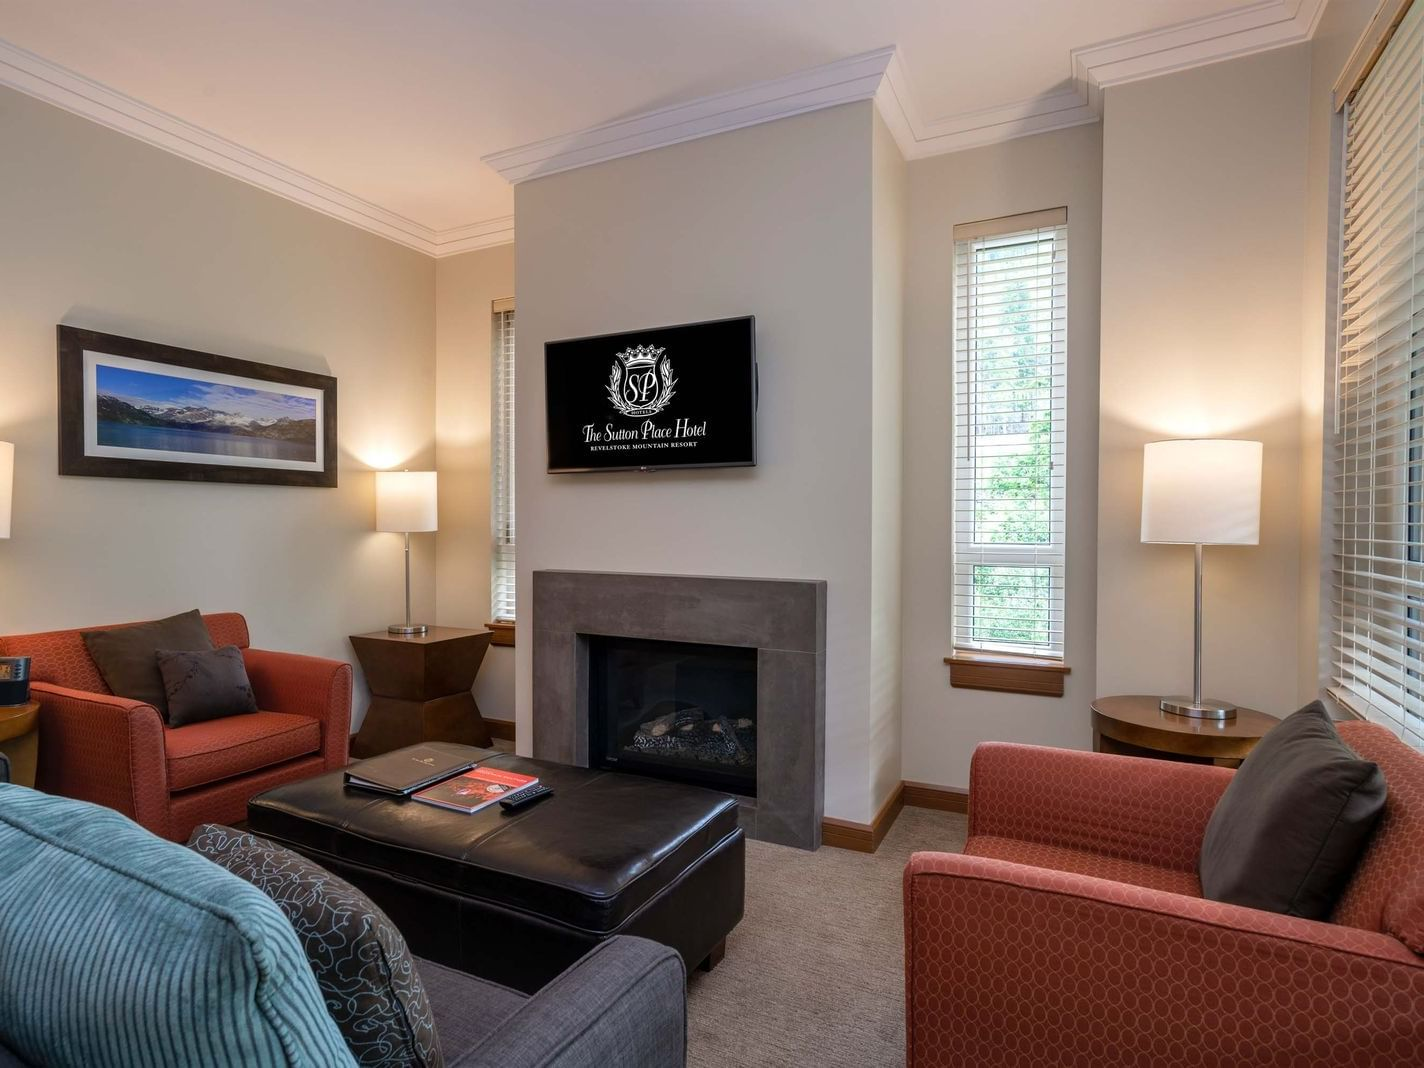 Three Bedroom Premium Suite The Sutton Place Hotel Revelstoke Mountain Resort